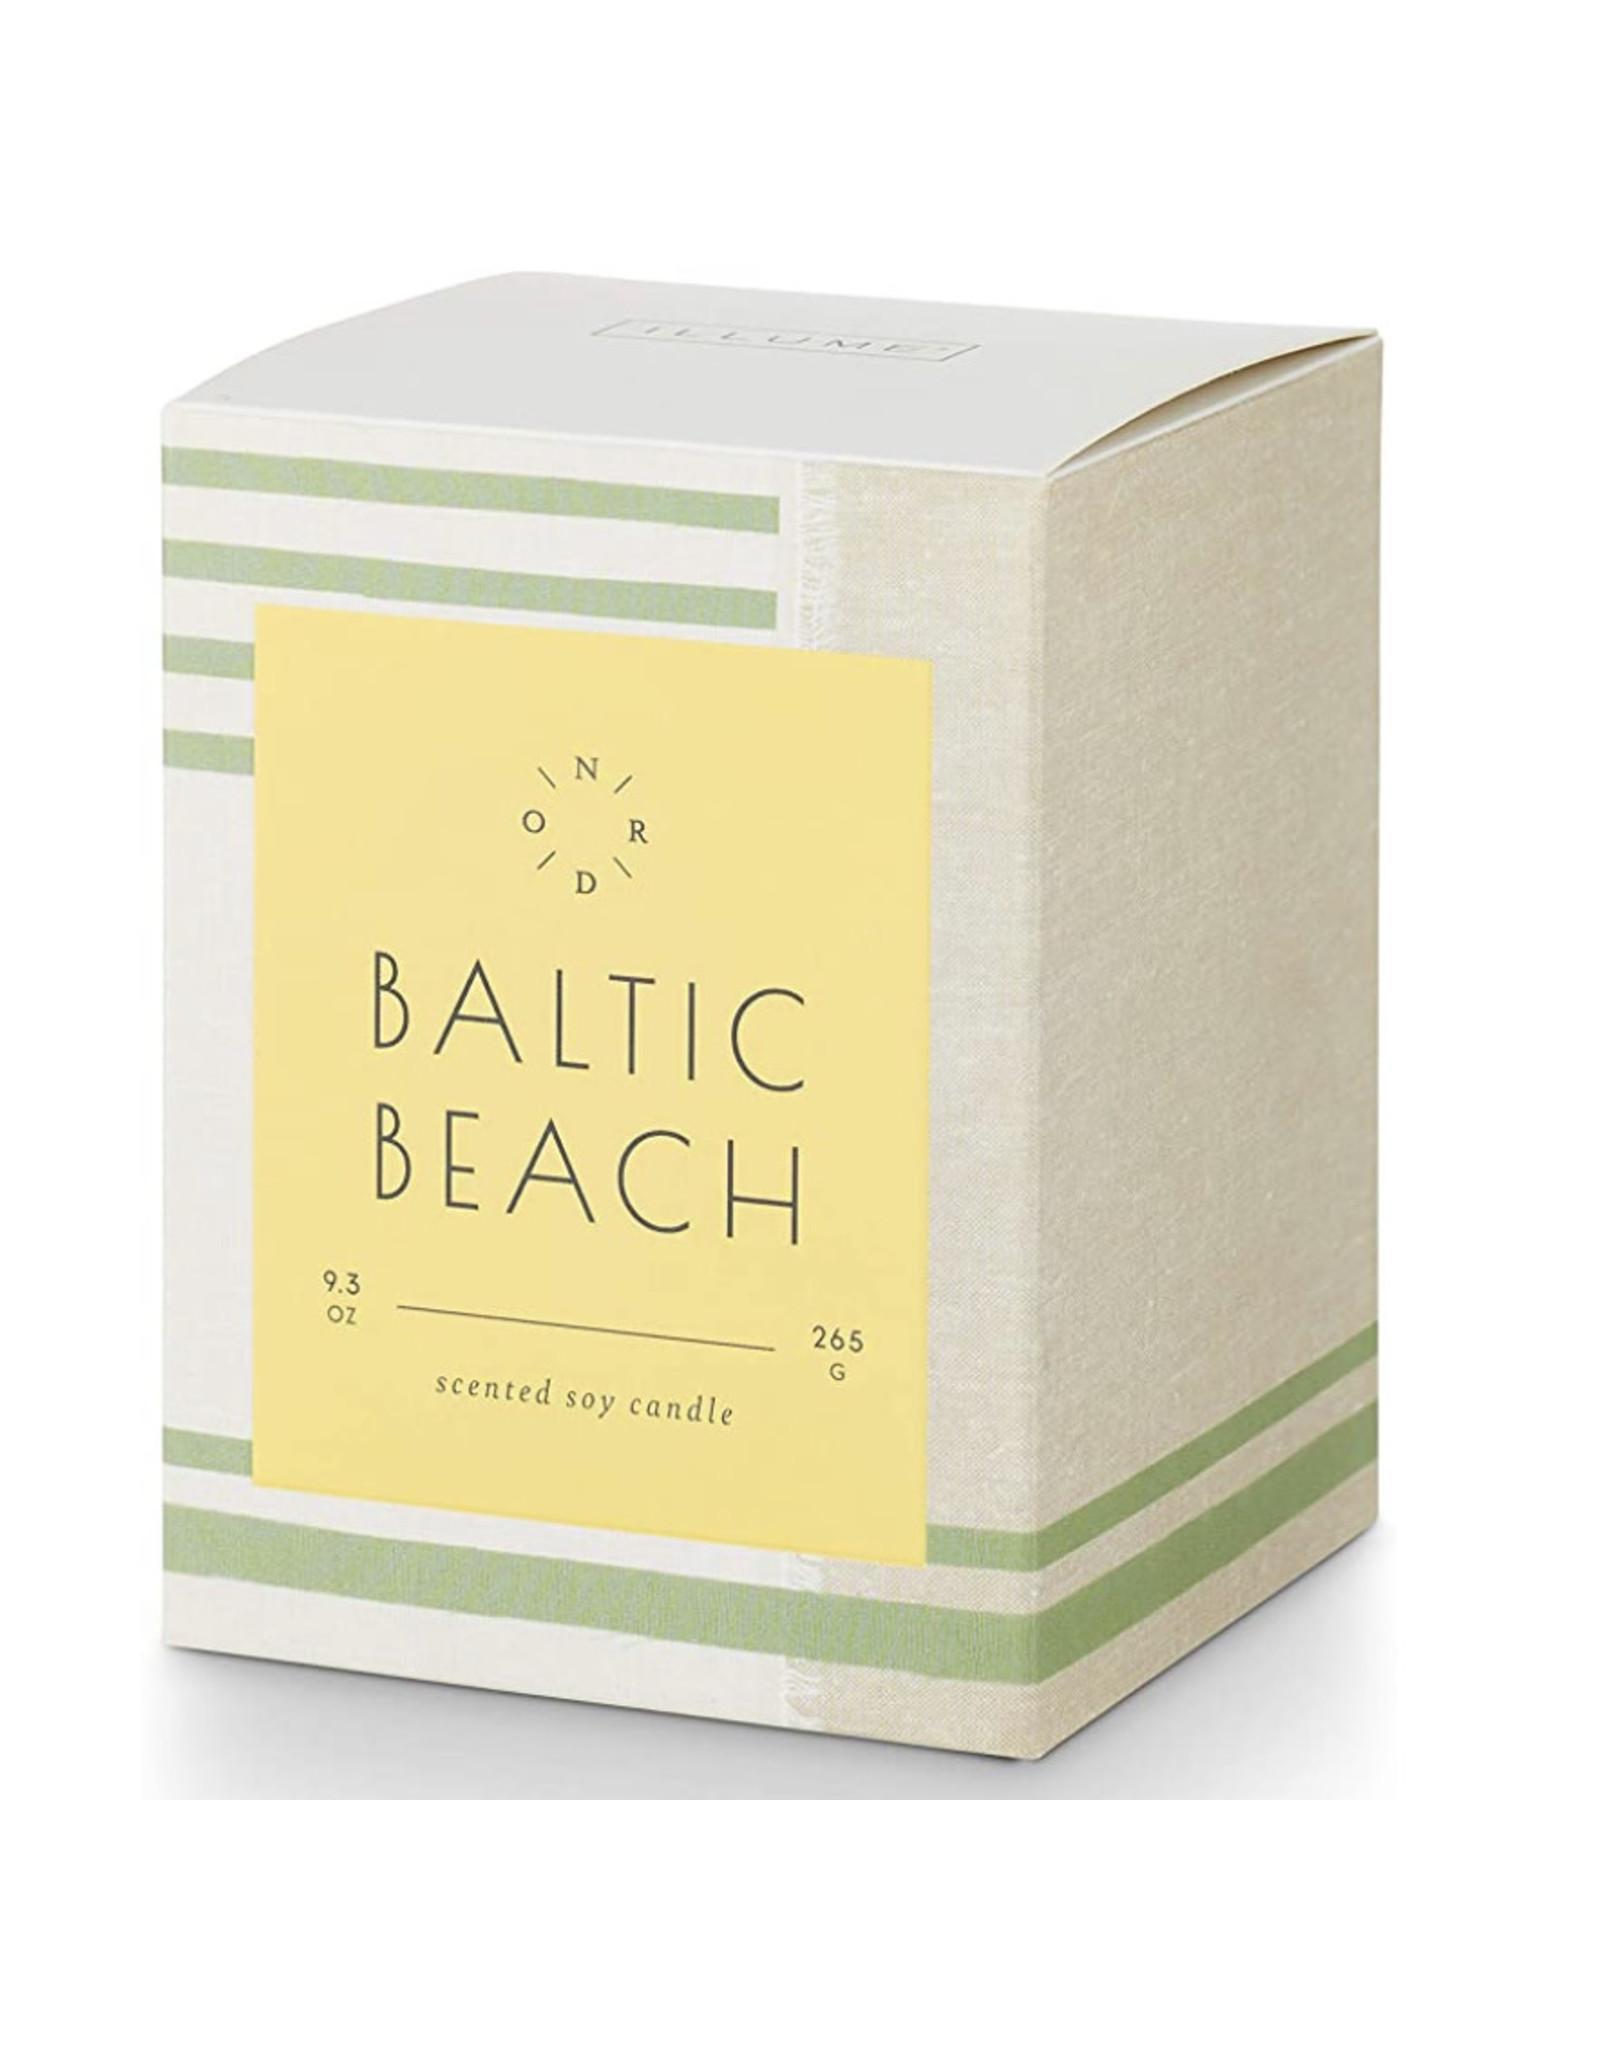 Illume Baltic Beach Fjord & Form Seafare Glass Candle